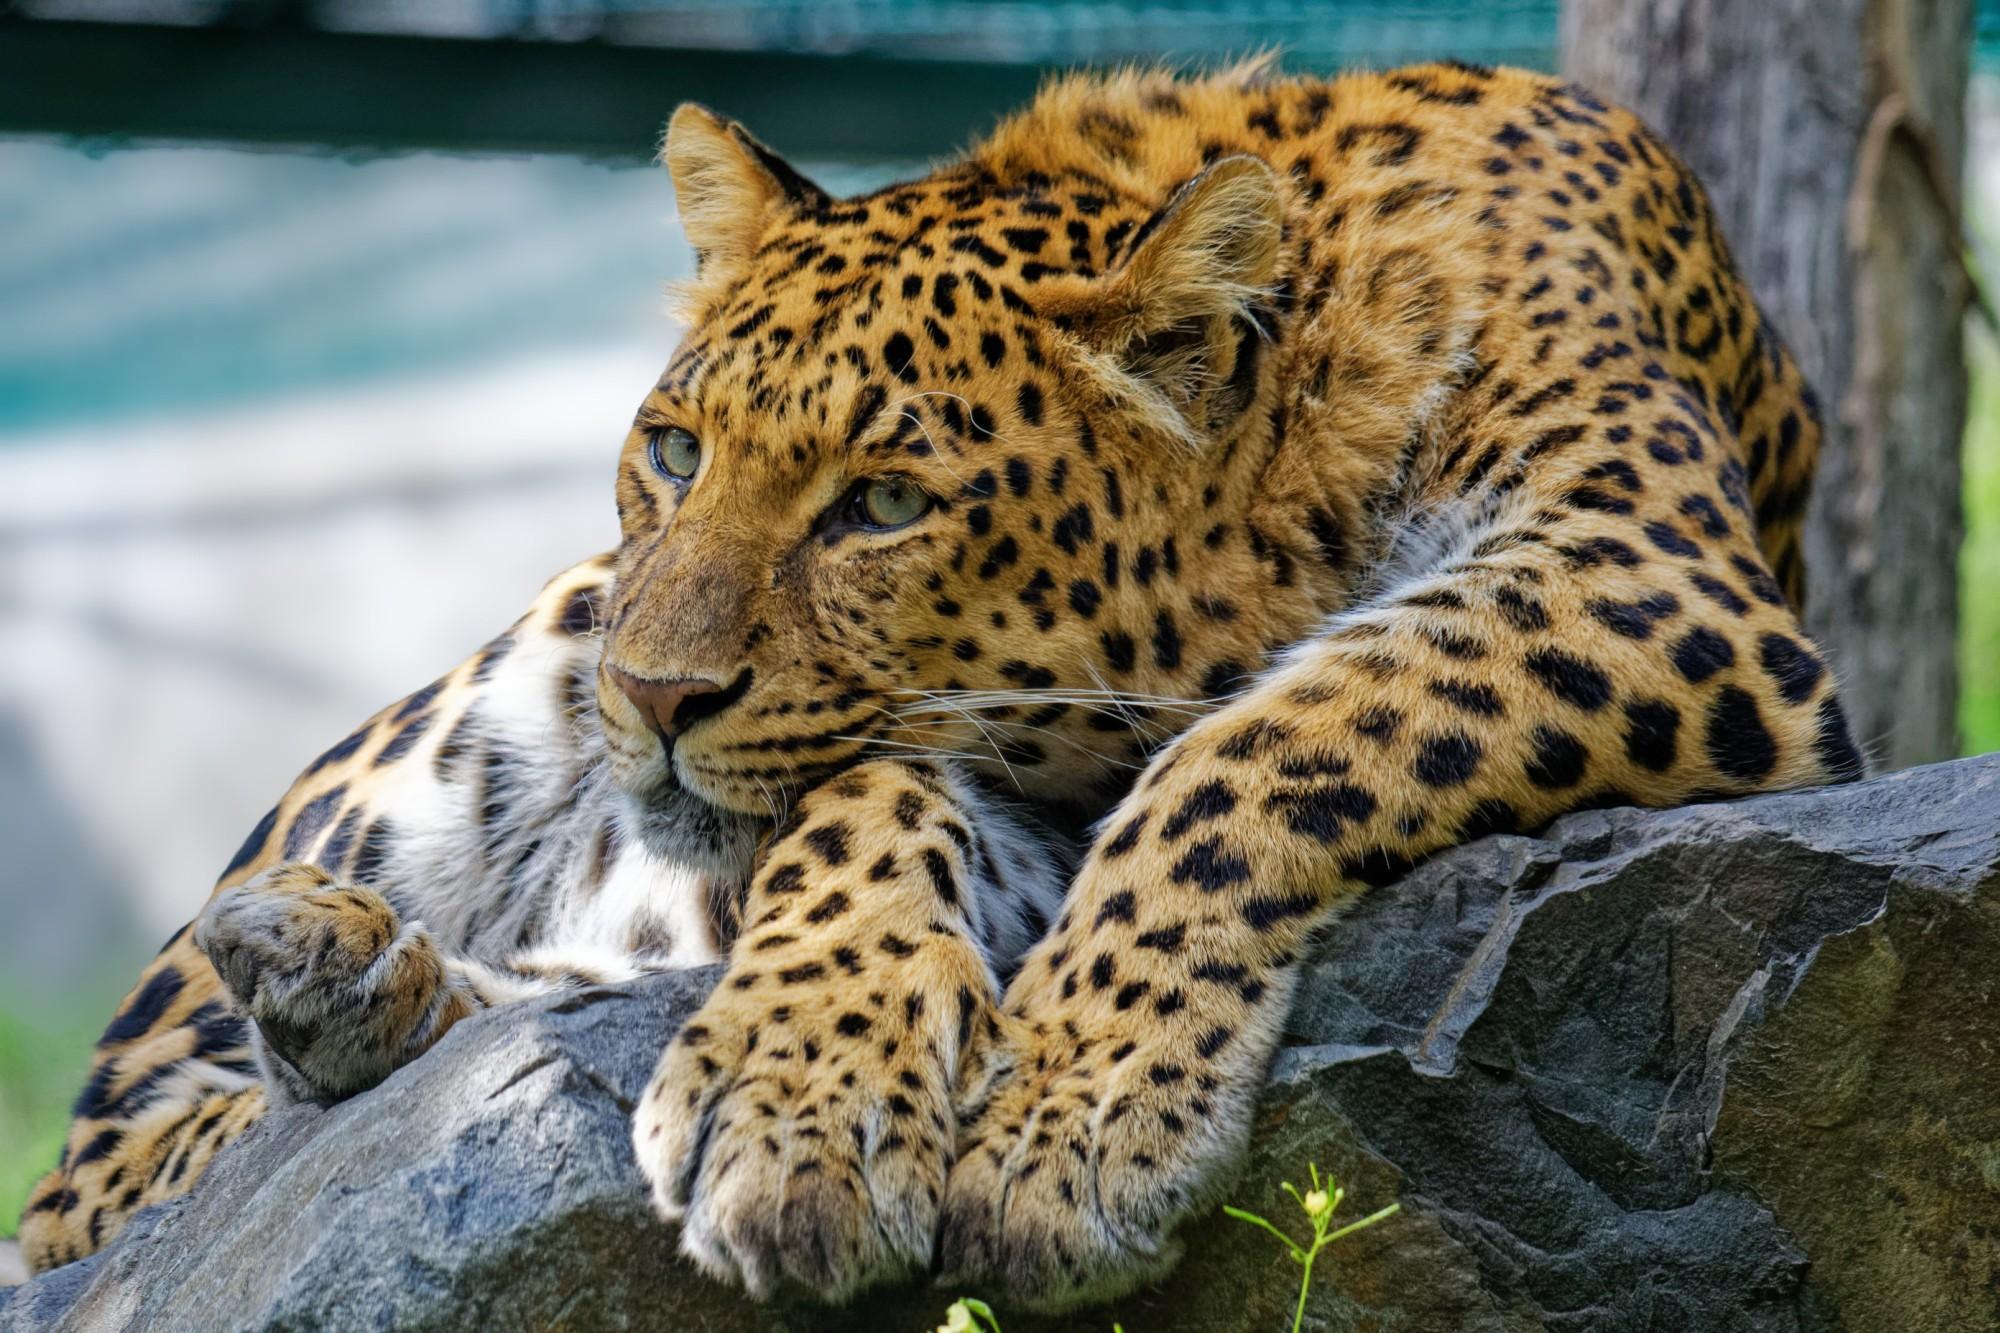 chinaleopard 2021-08-08